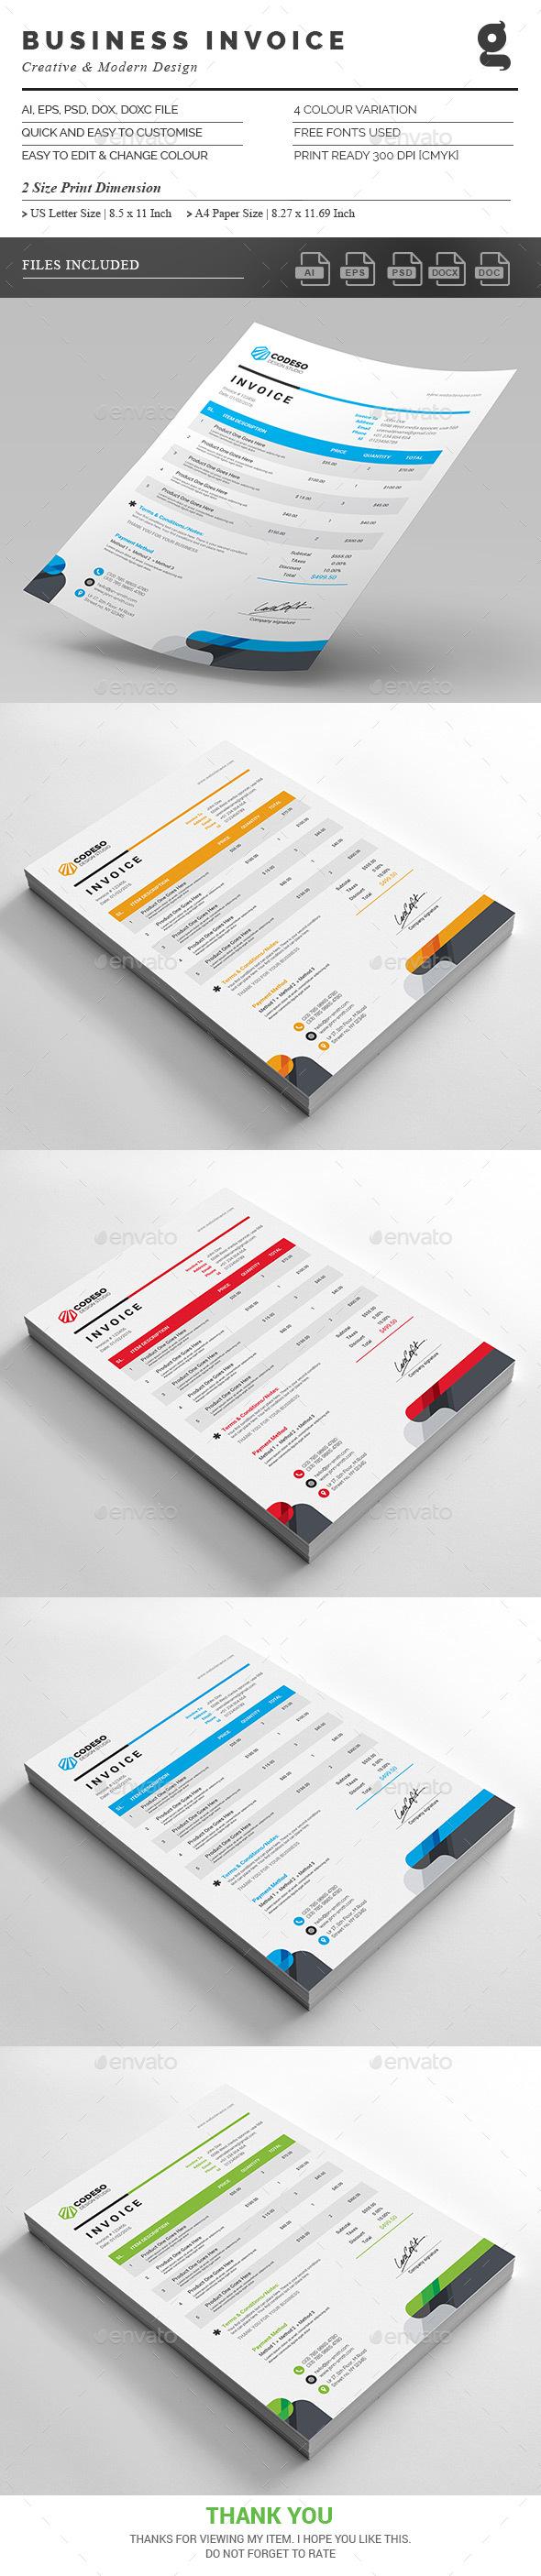 Invoice by GenerousArtist Invoice DesignInvoice TemplateProposal